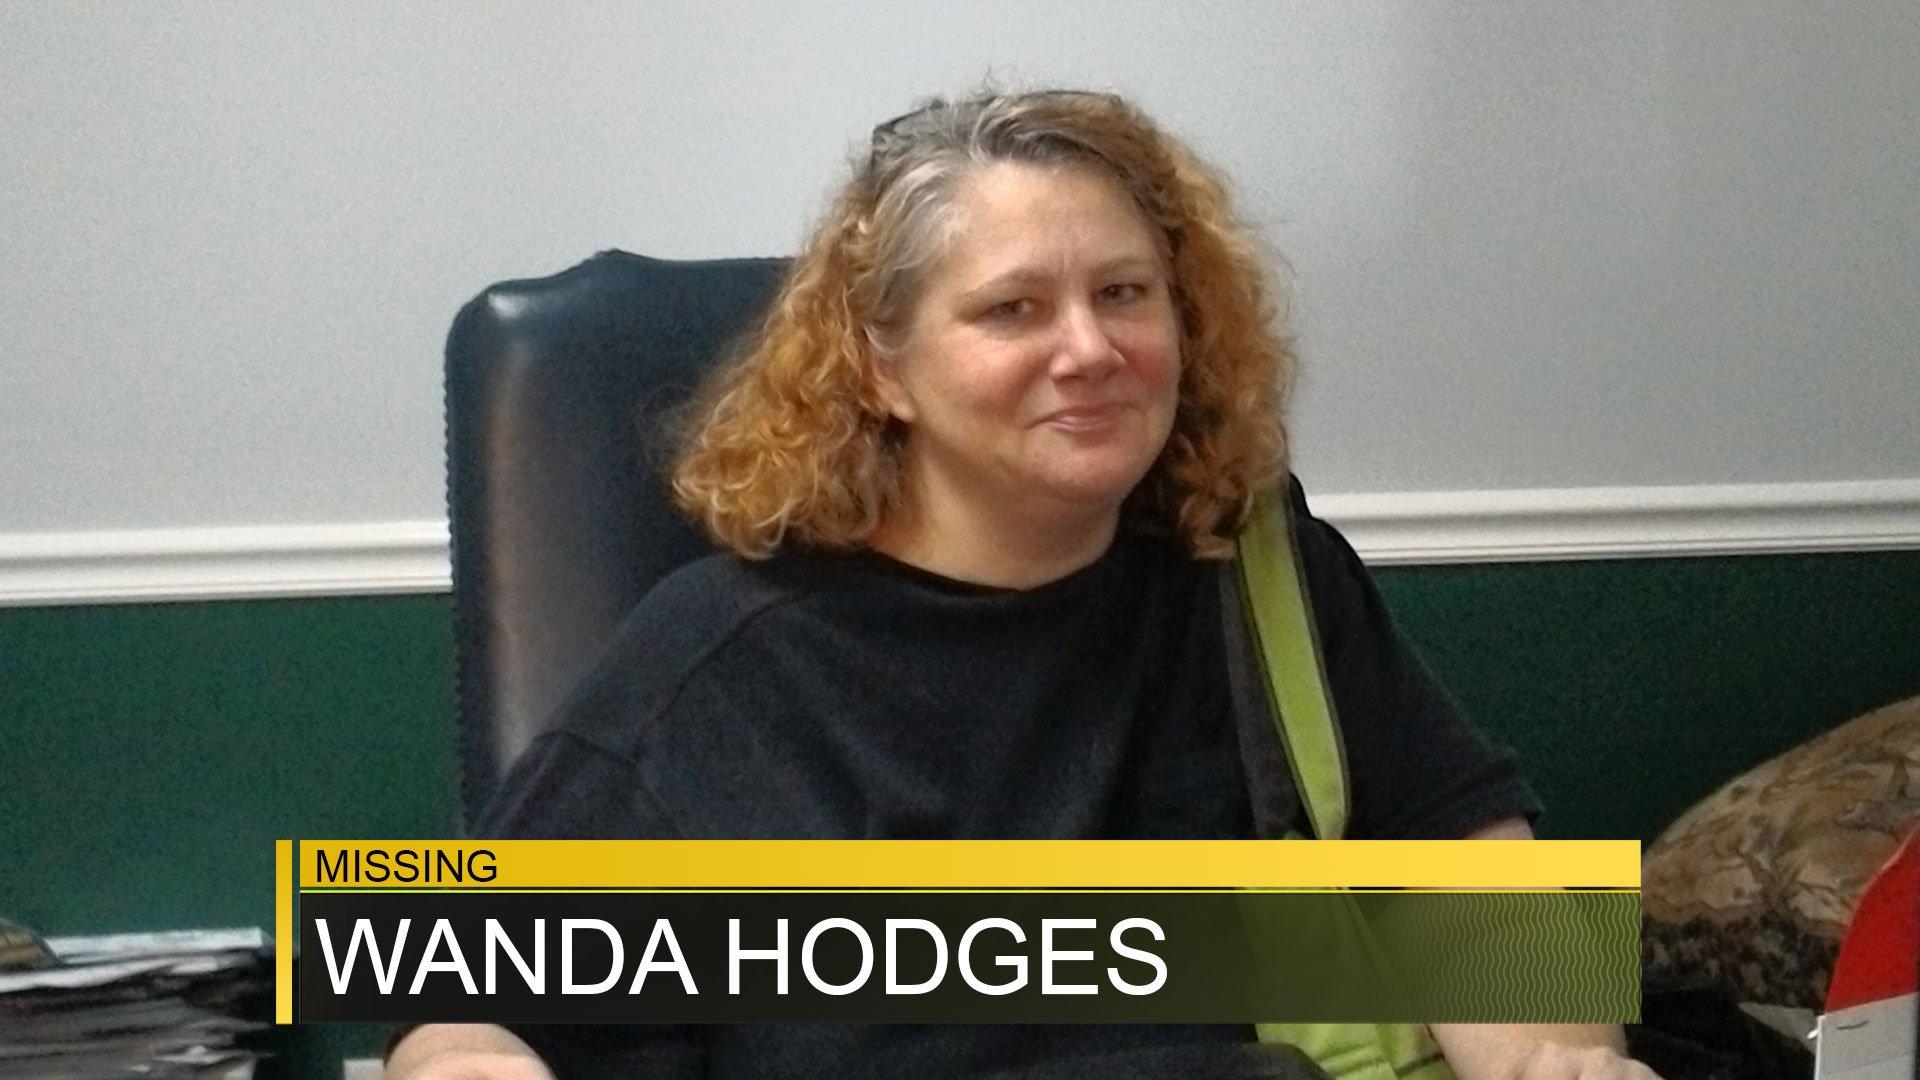 Wanda Hodges (Jefferson County Sheriff's Office)